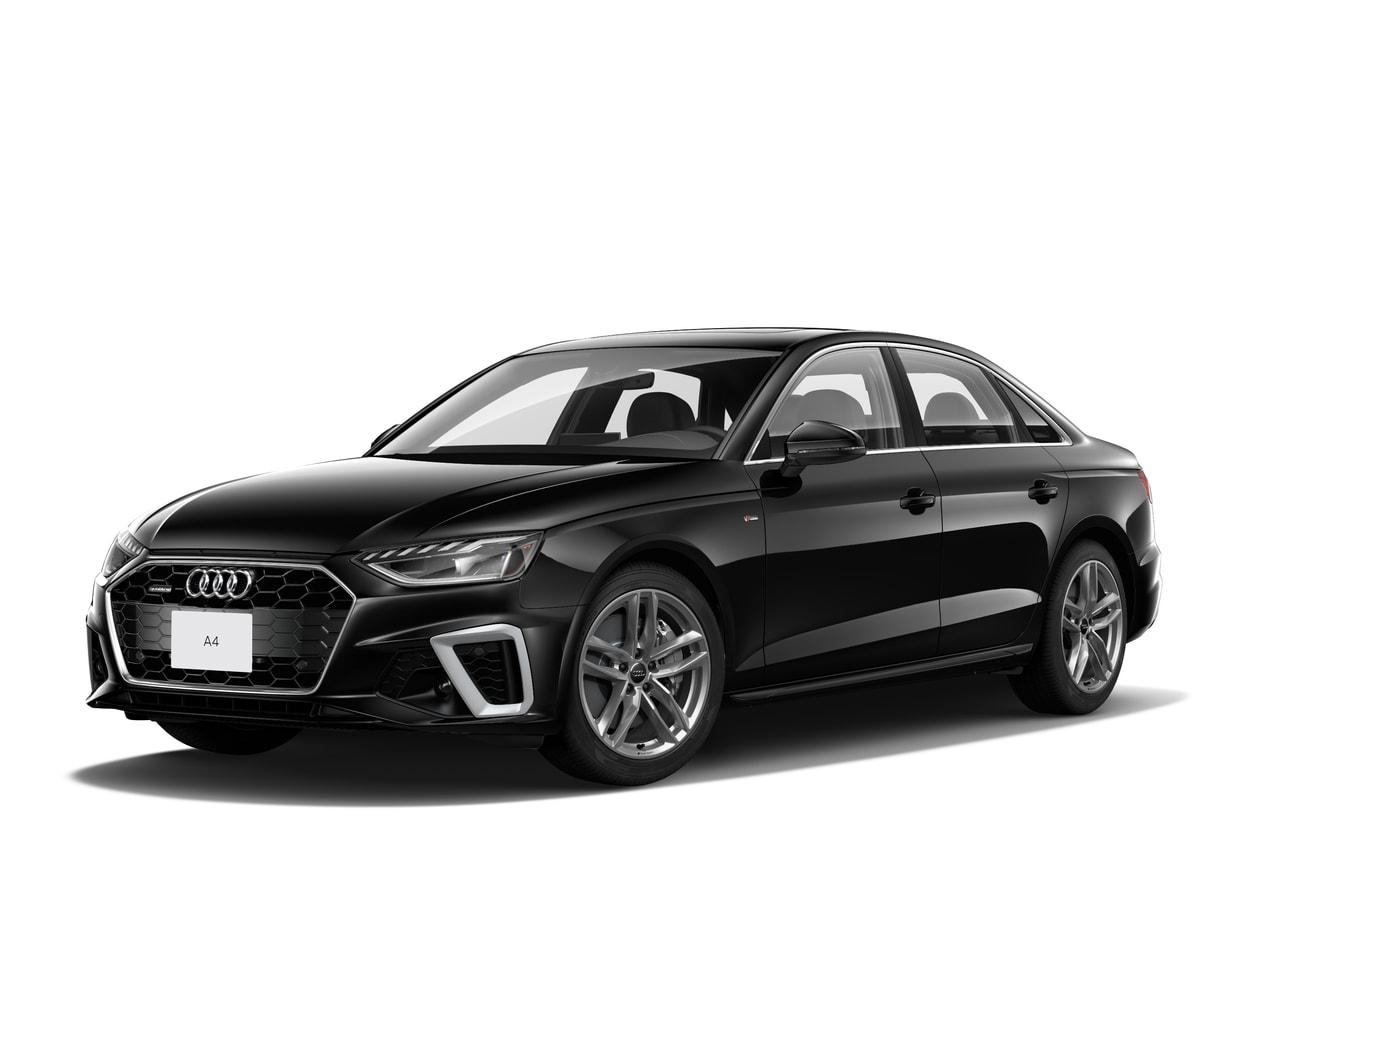 2020 Audi A4 Sport Utility Vehicle